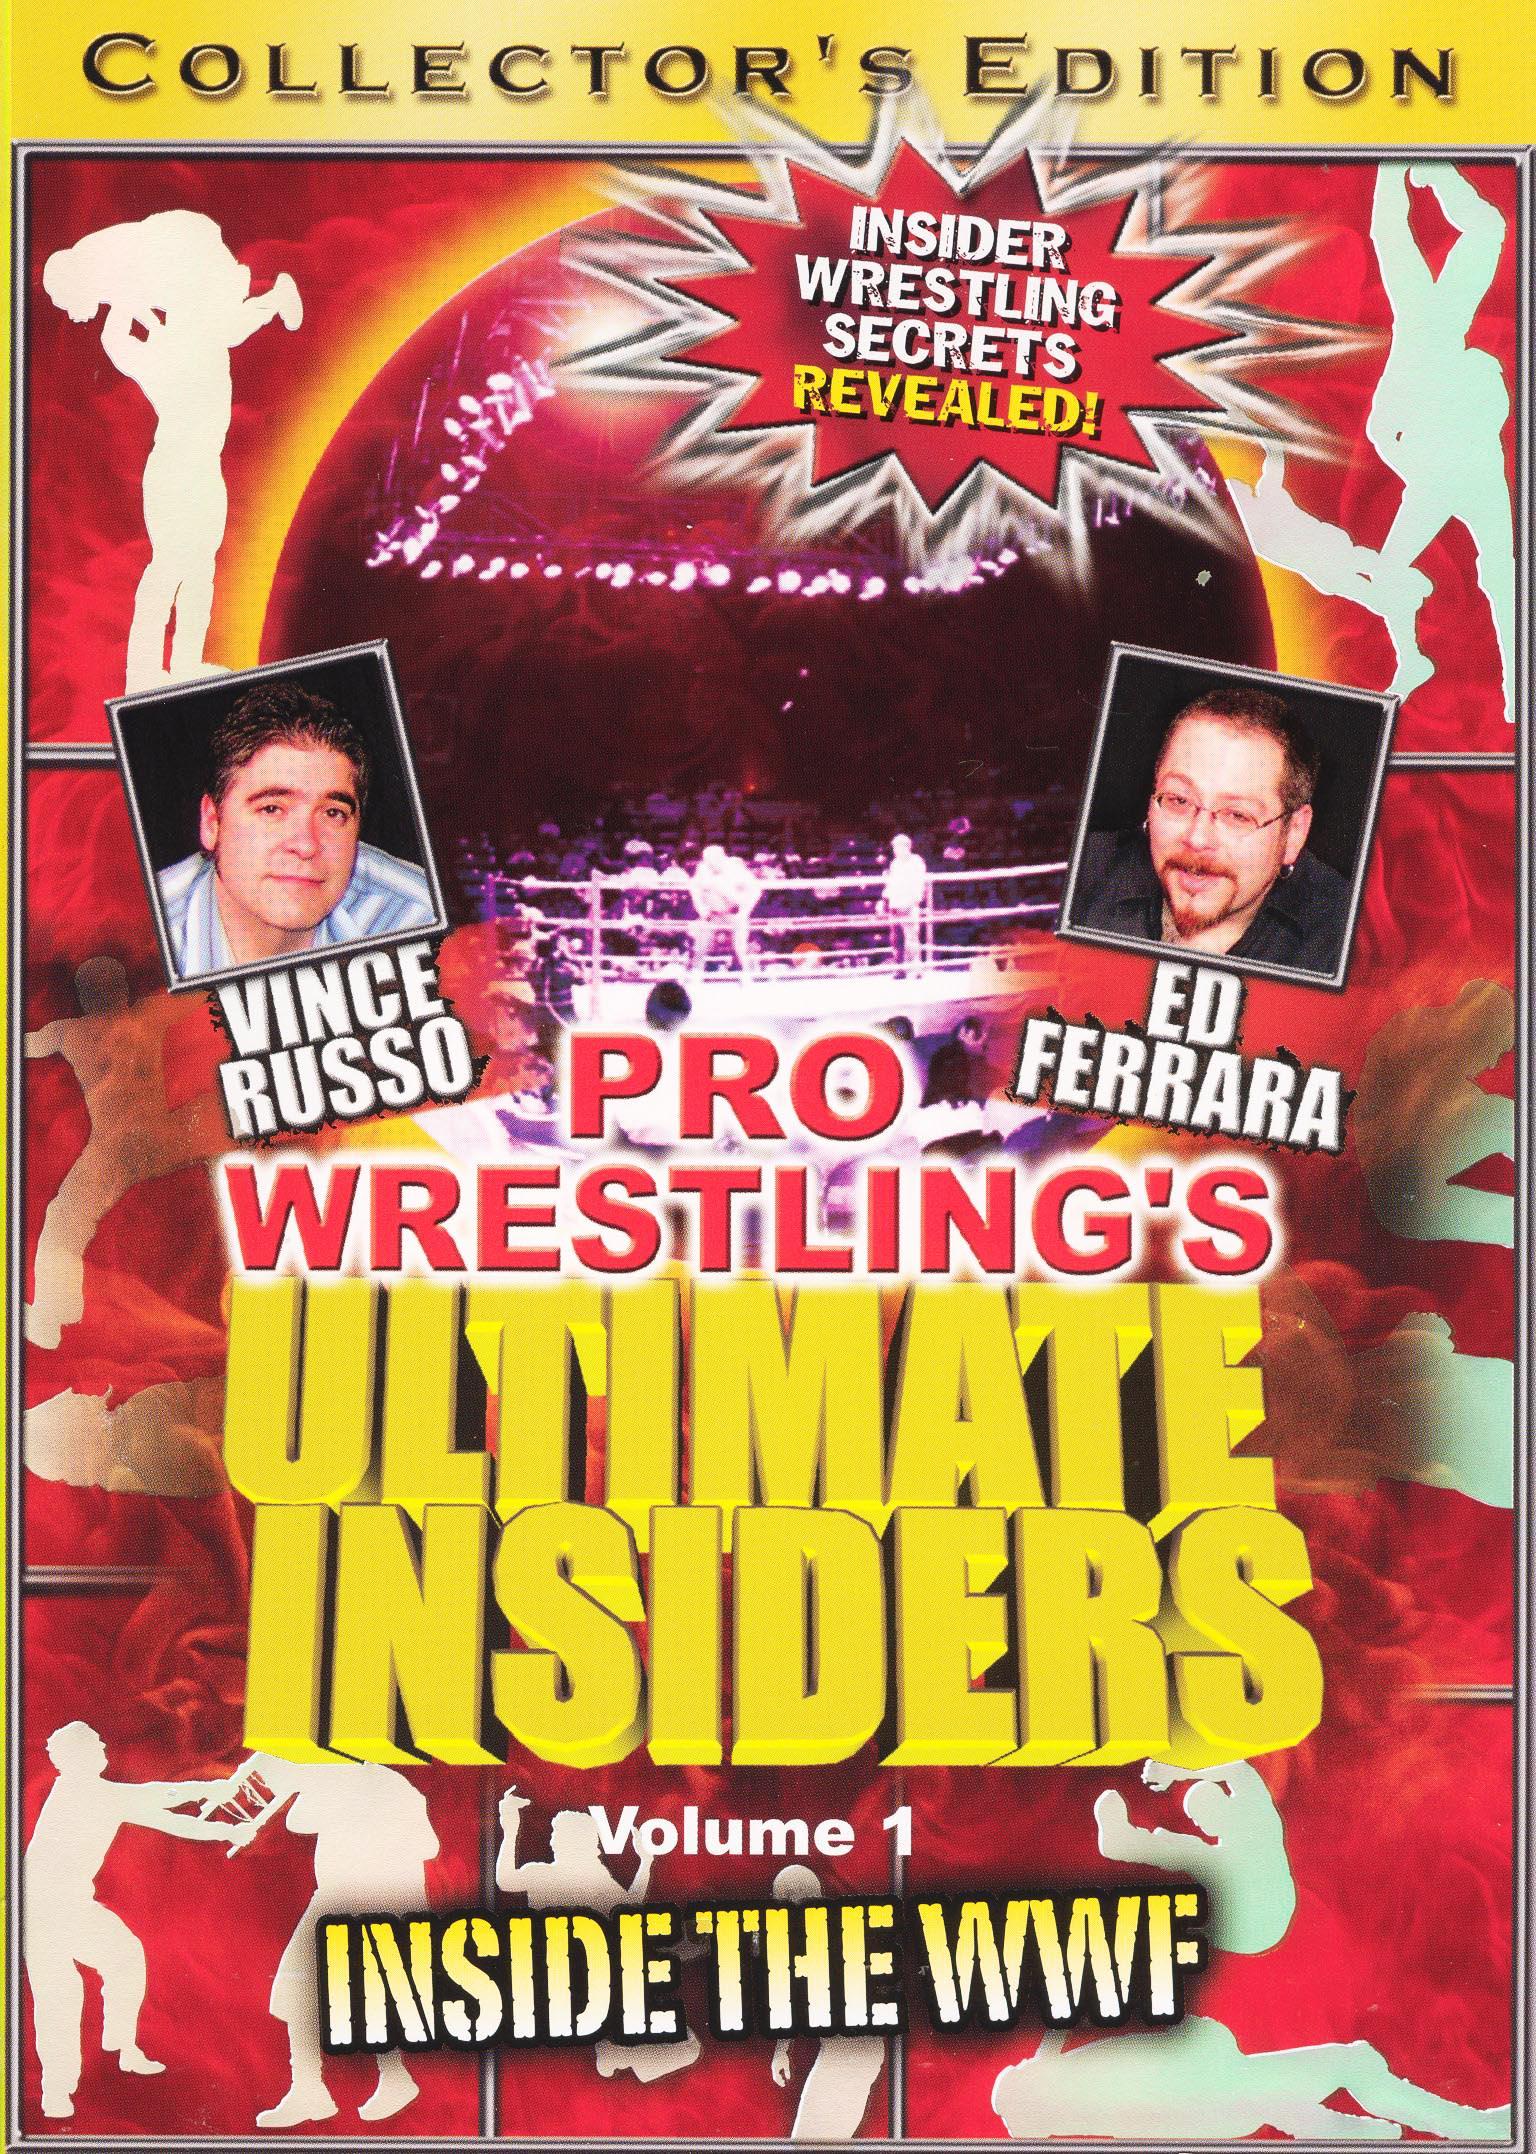 Pro Wrestling's Ultimate Insiders, Vol. 1: Inside the WWF